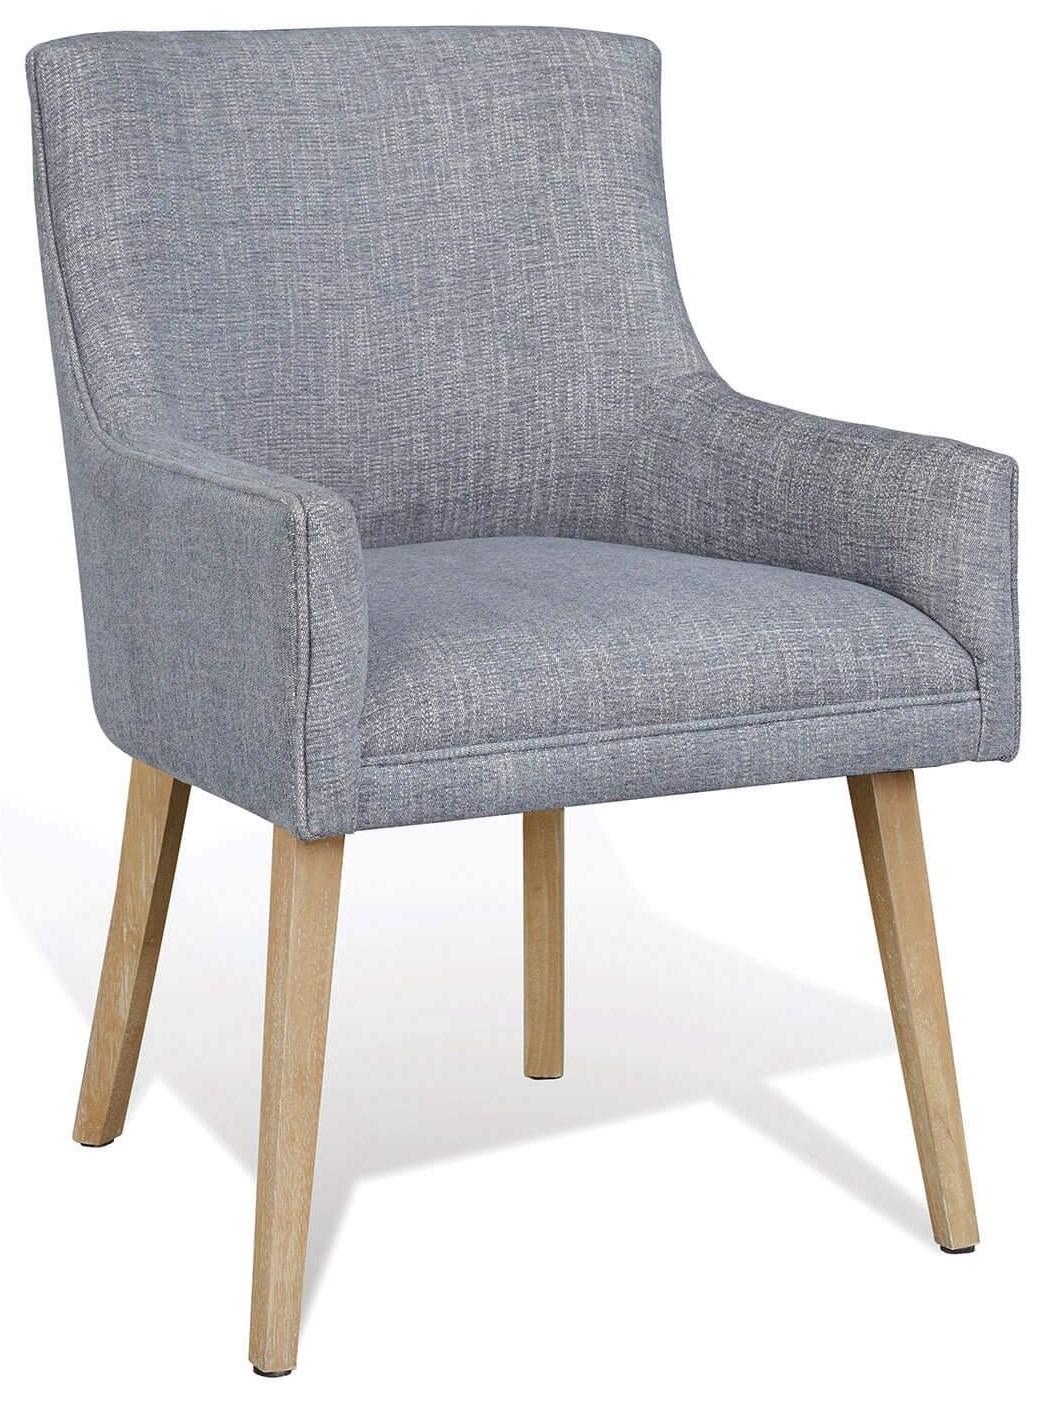 Sarah Richardson Boulevard Bv Arch Arm Chair/pale Blue by Palliser at Stoney Creek Furniture